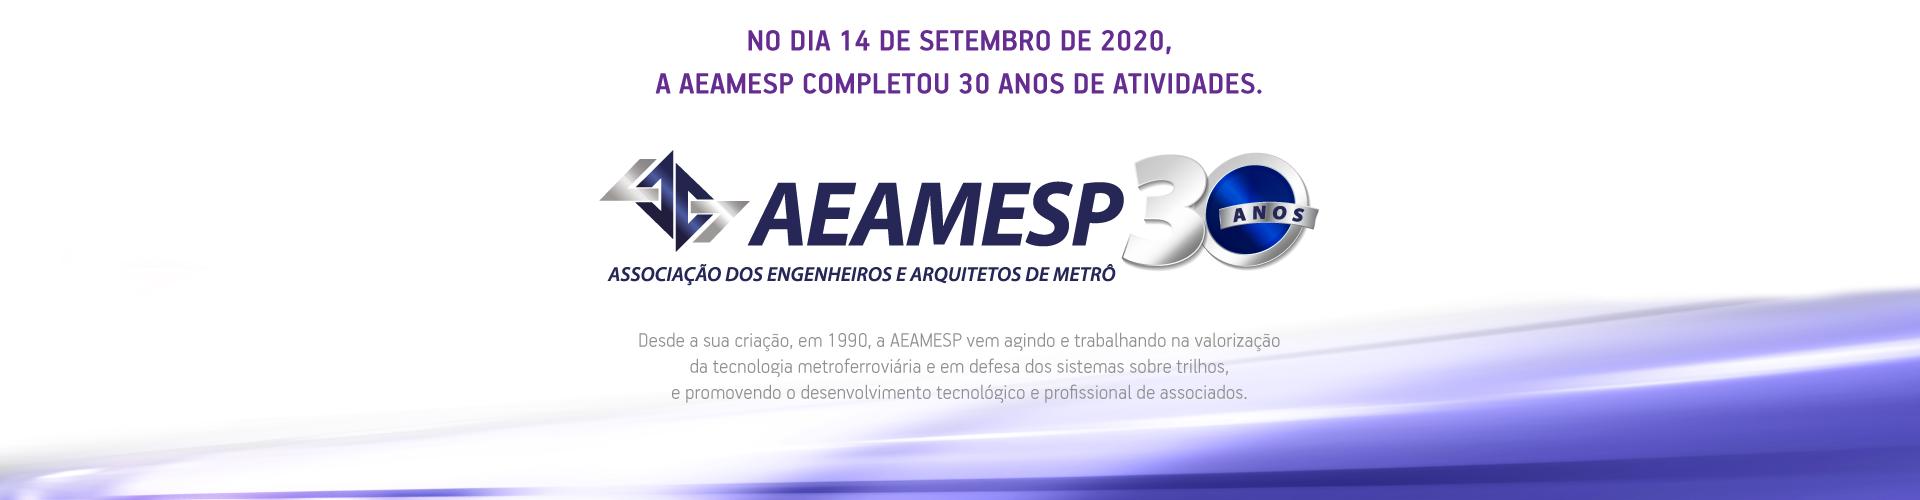 AEAMESP_26A_STM-03